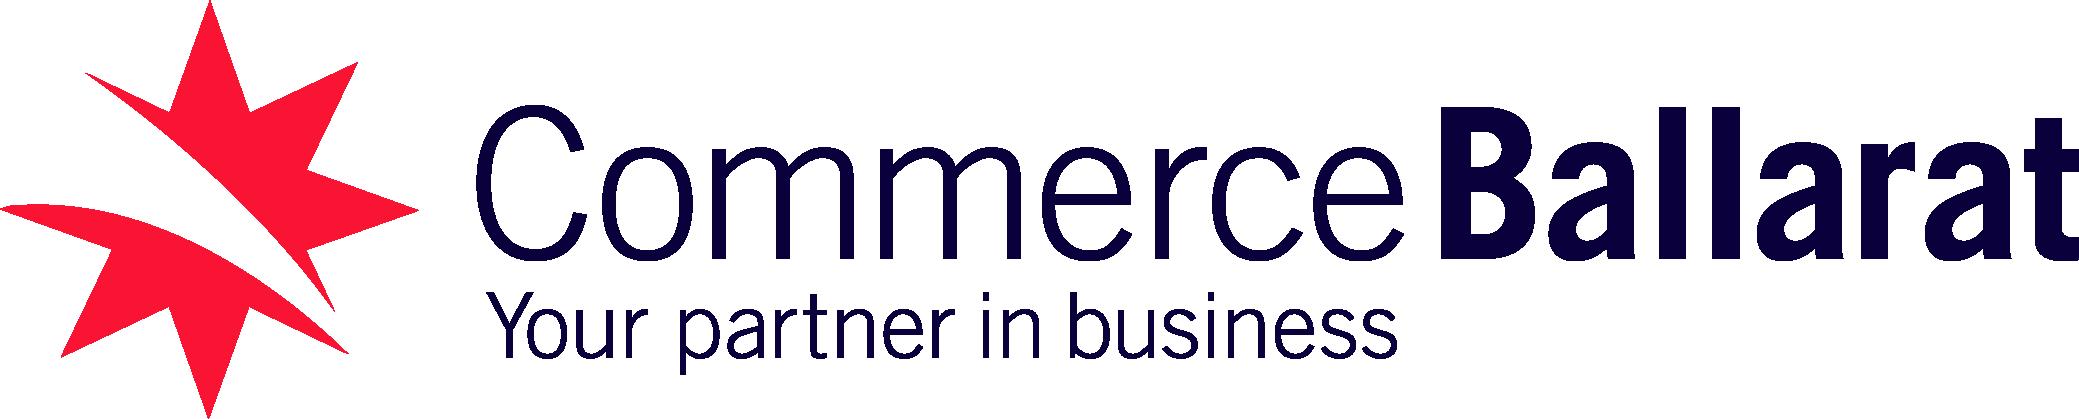 Commerce Ballarat Logo